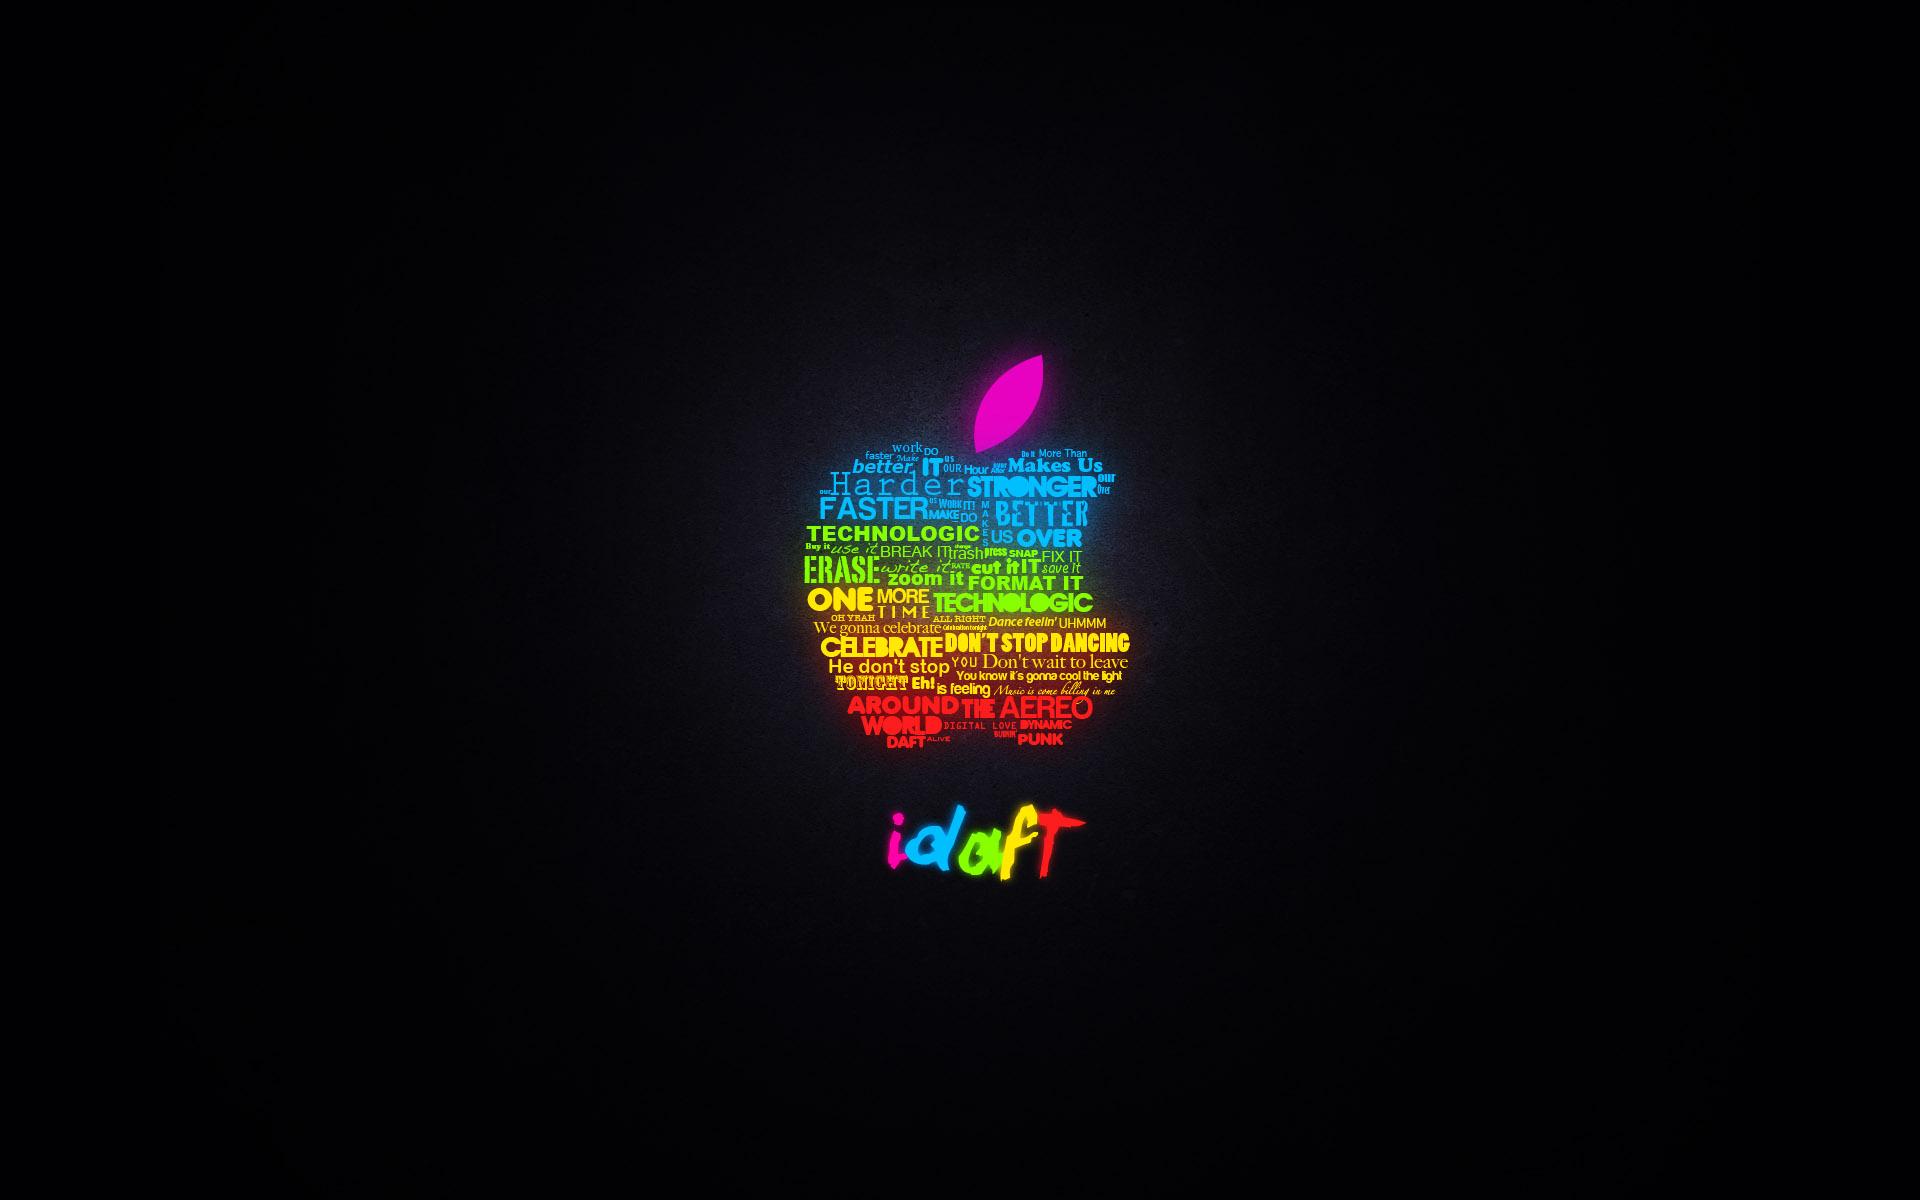 apple_wallpaper_001